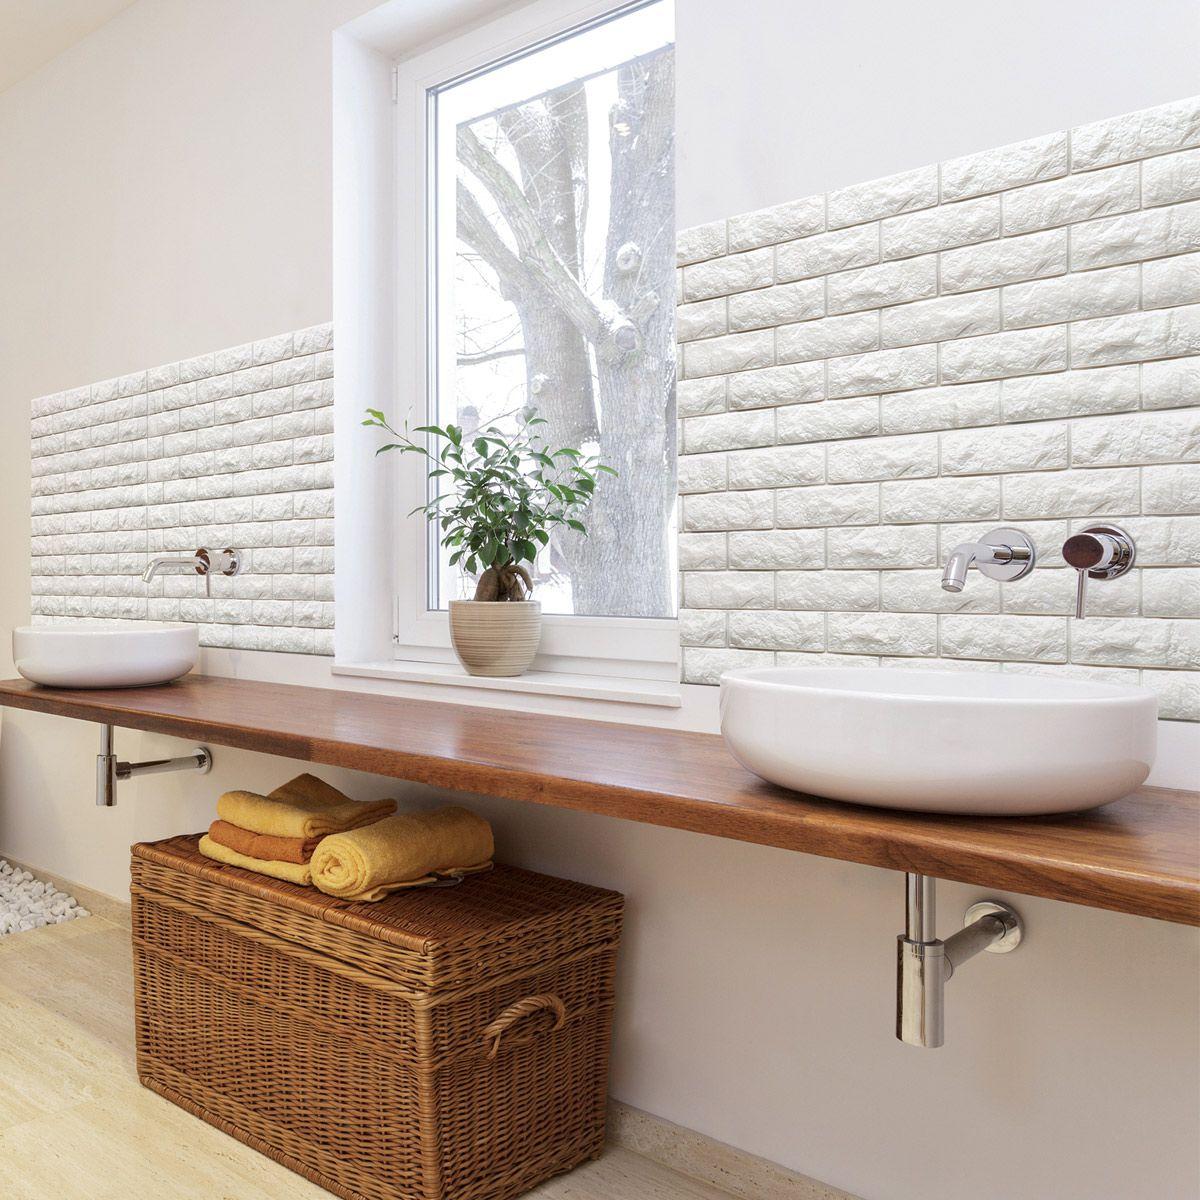 A06501 Peel & Stick 3D Wall Panels Foam Block Brick Design 10 ...